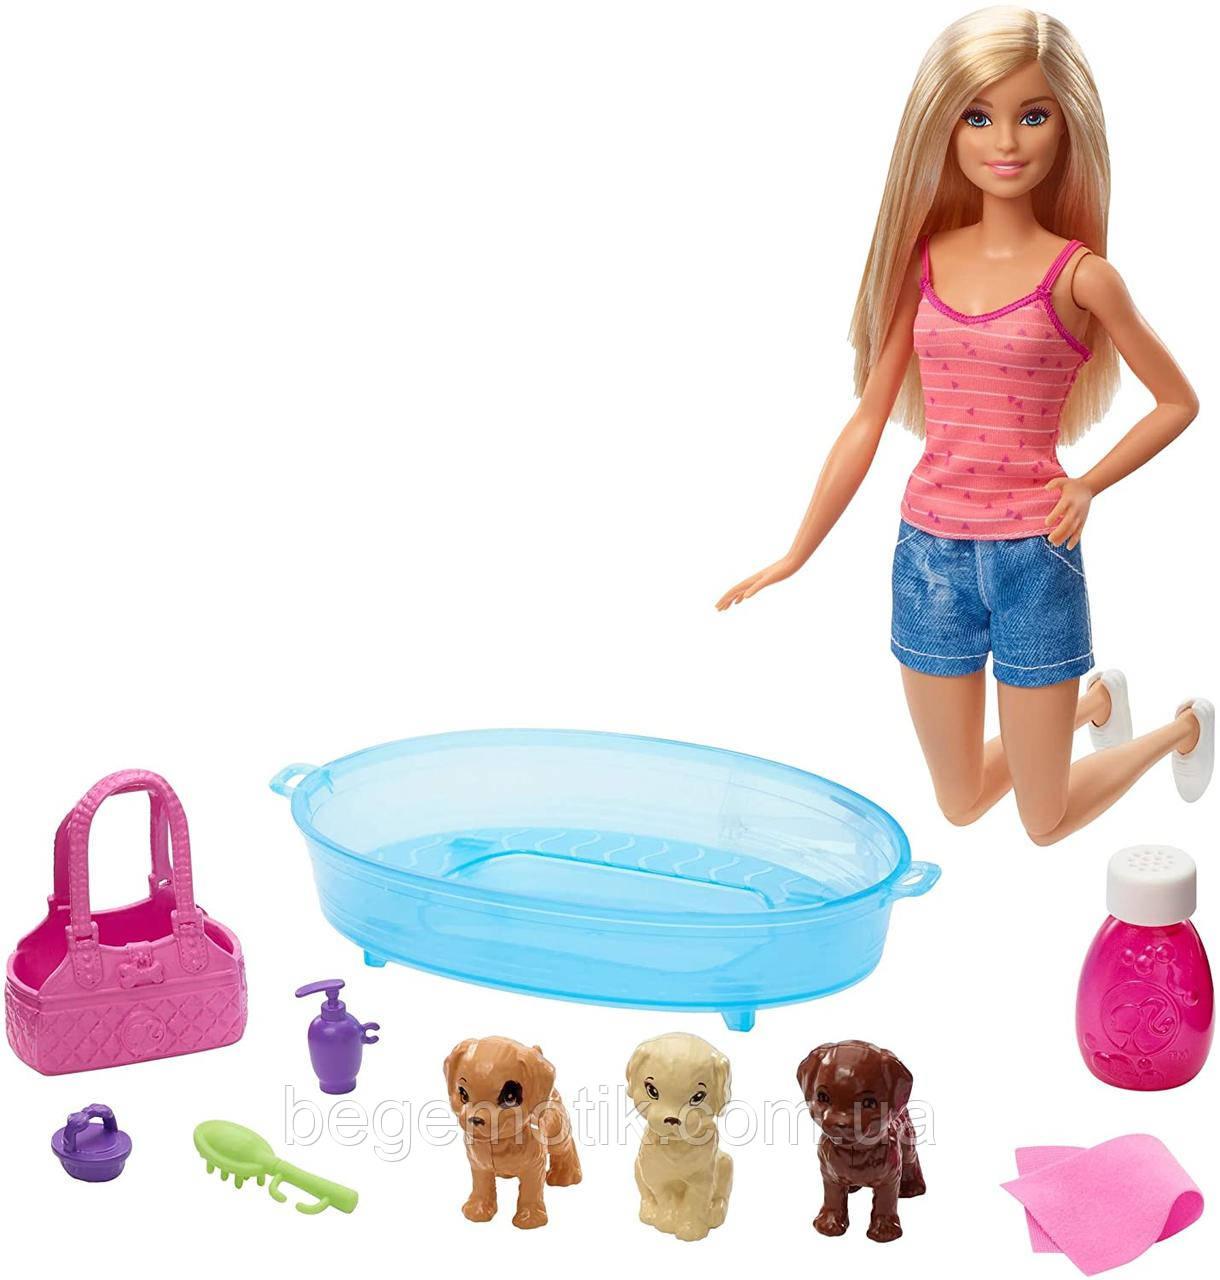 Barbie Кукла Барби купание щенков Barbie Doll GDJ37 Blonde and Playset with 3 Puppies